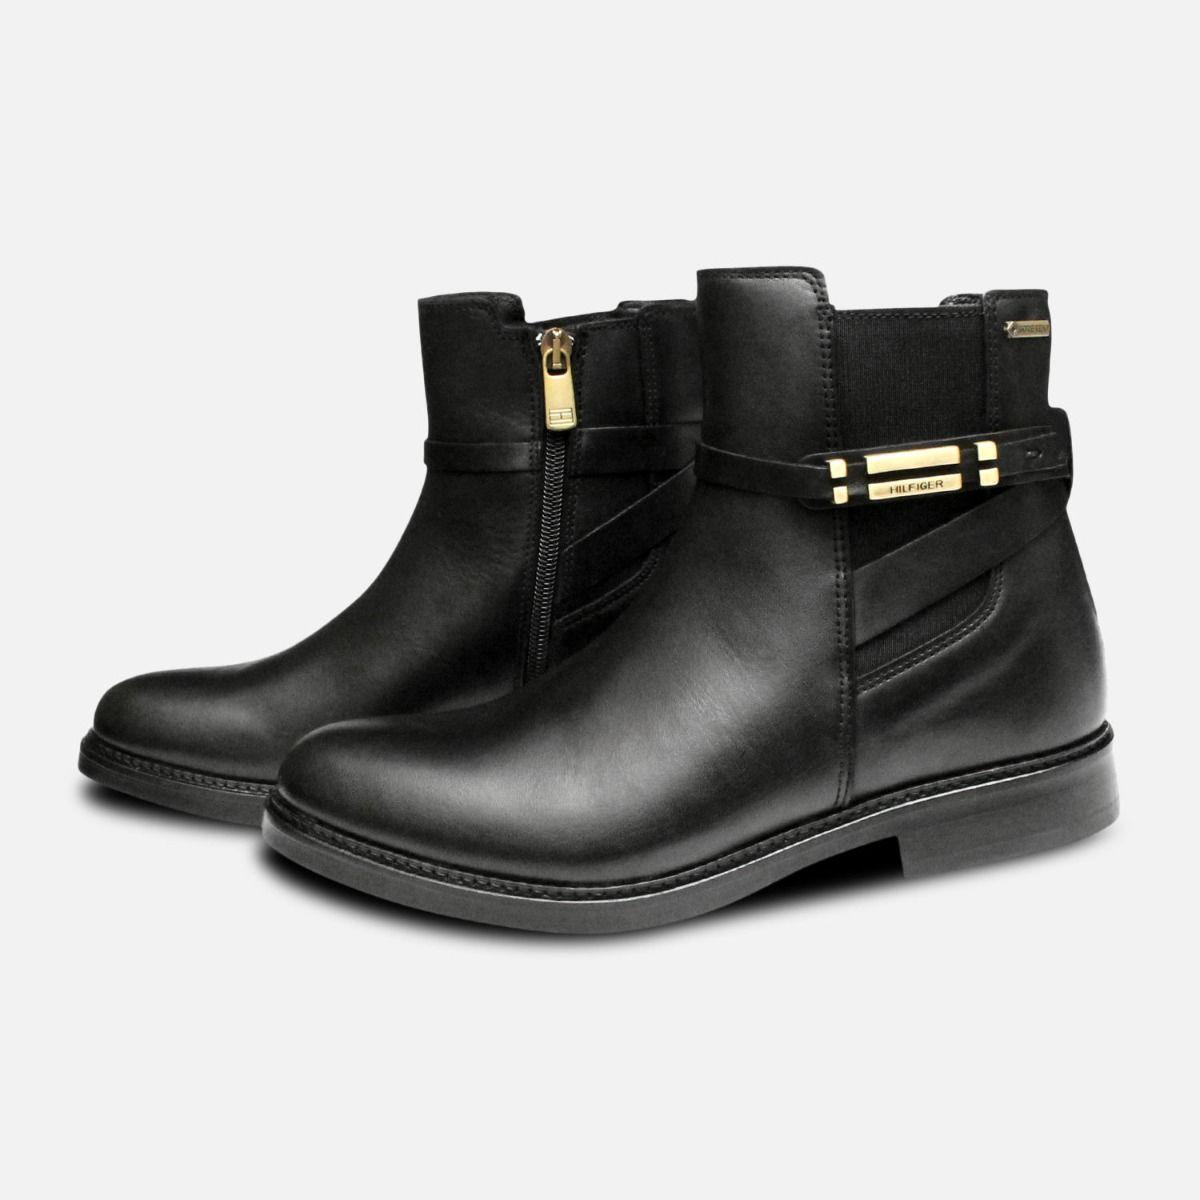 c43ec2fe5f7 Waterproof Tommy Hilfiger Black Holly Chelsea Boots